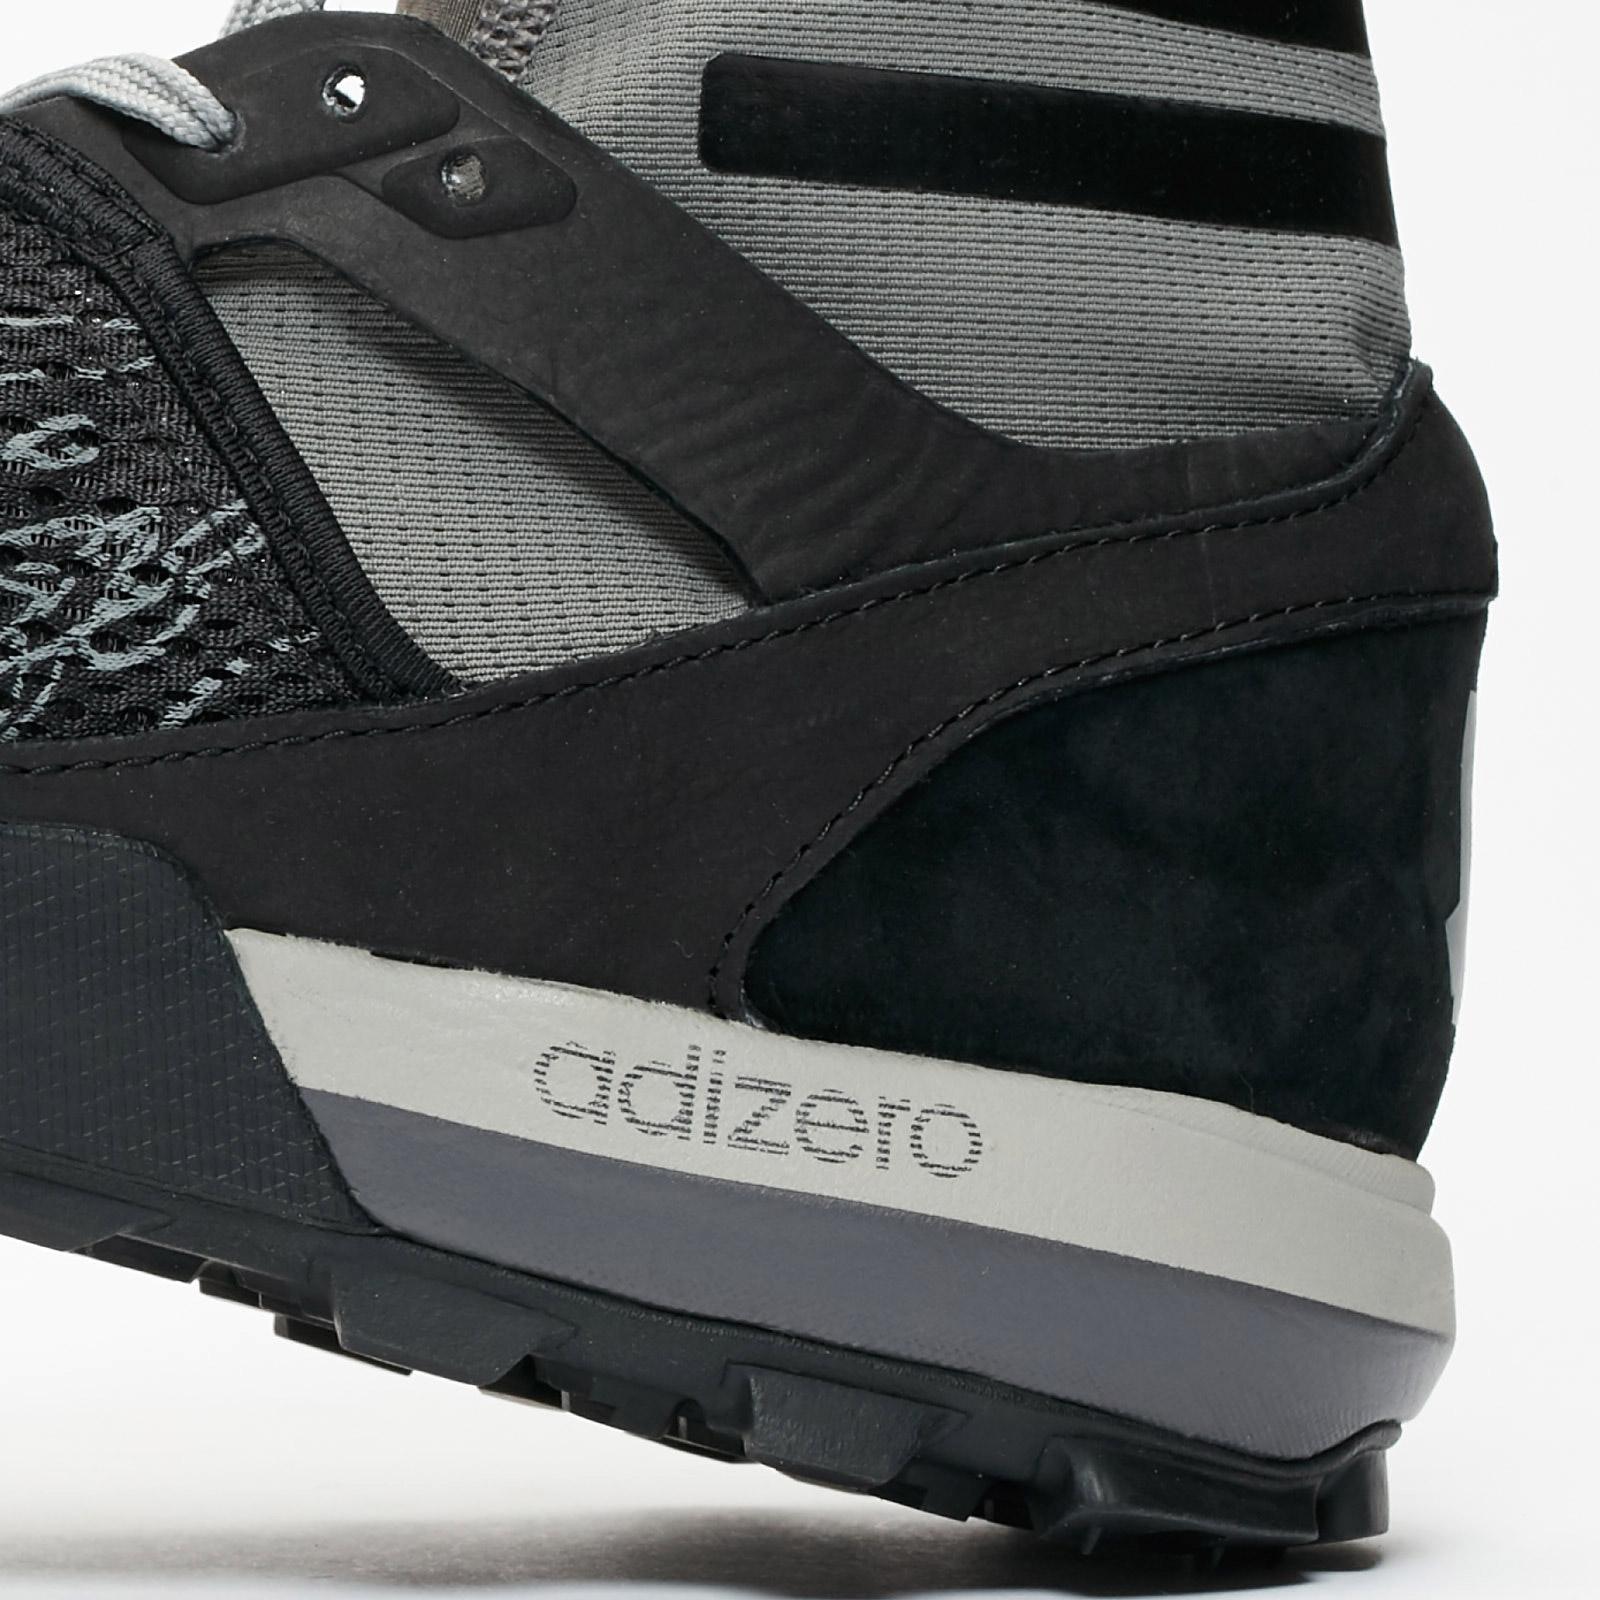 save off f1c00 b761e adidas Consortium Adizero XT Boost x UNDFTD - 7. Close